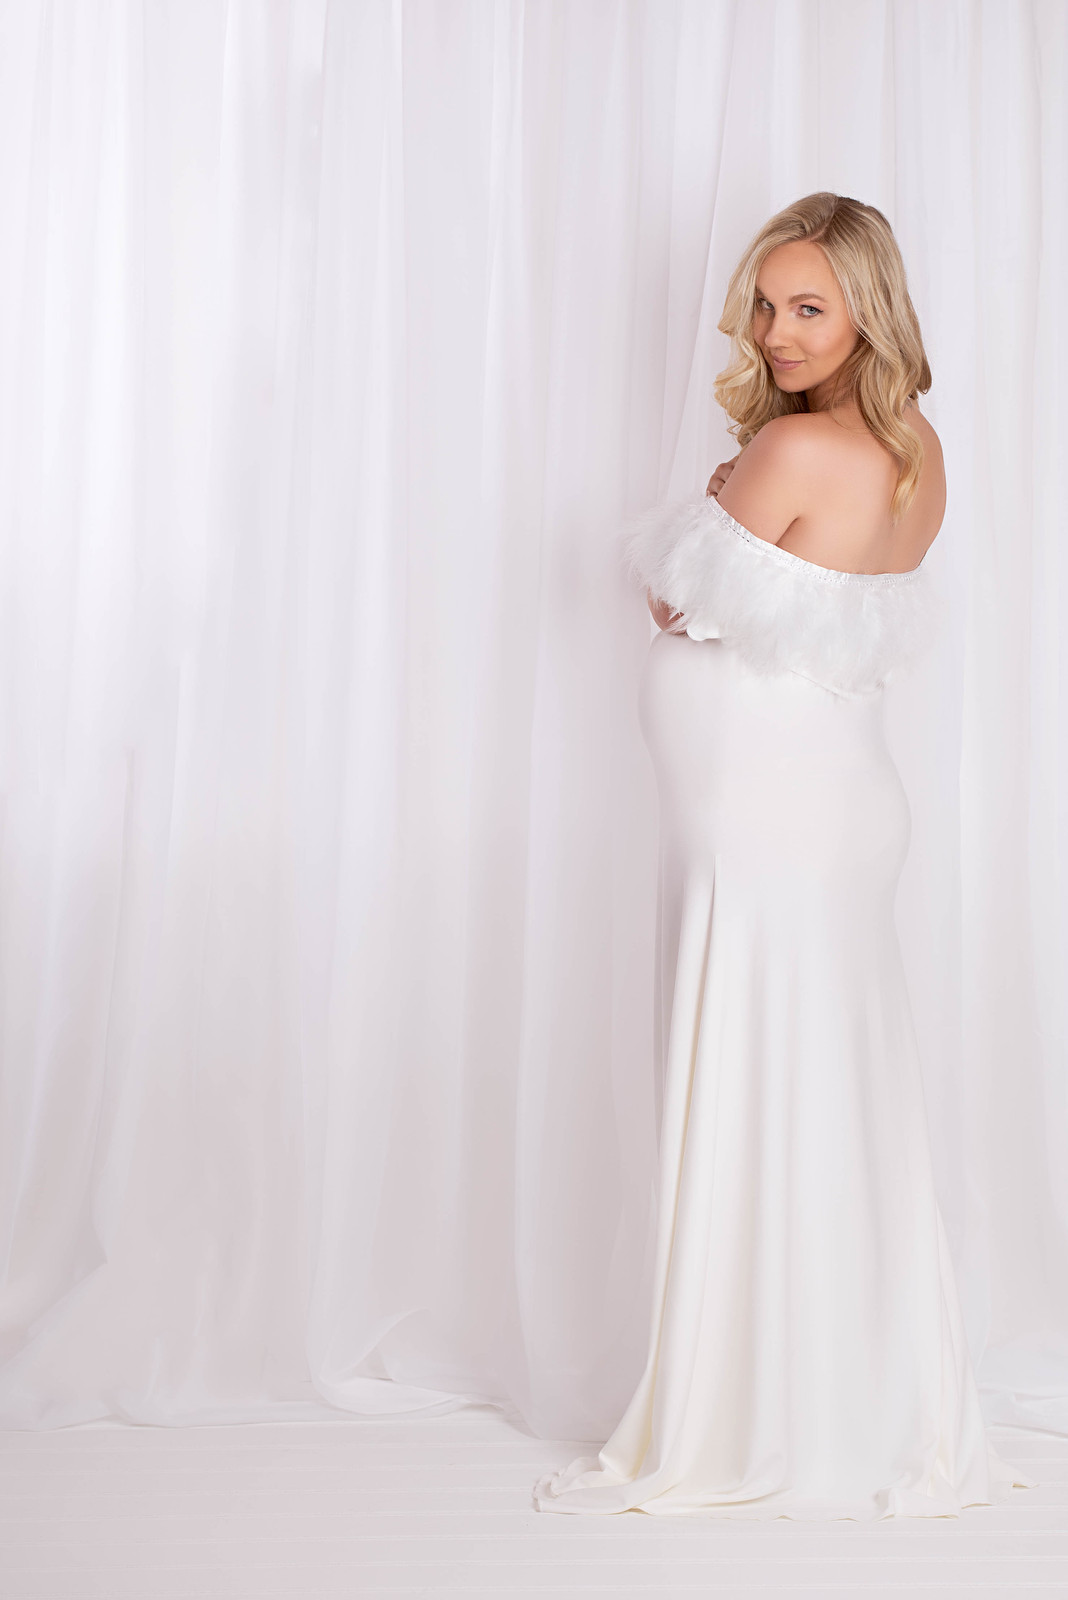 dc5858854ba30 Maternity | Newborn Photographer | Overland Park | Lenexa